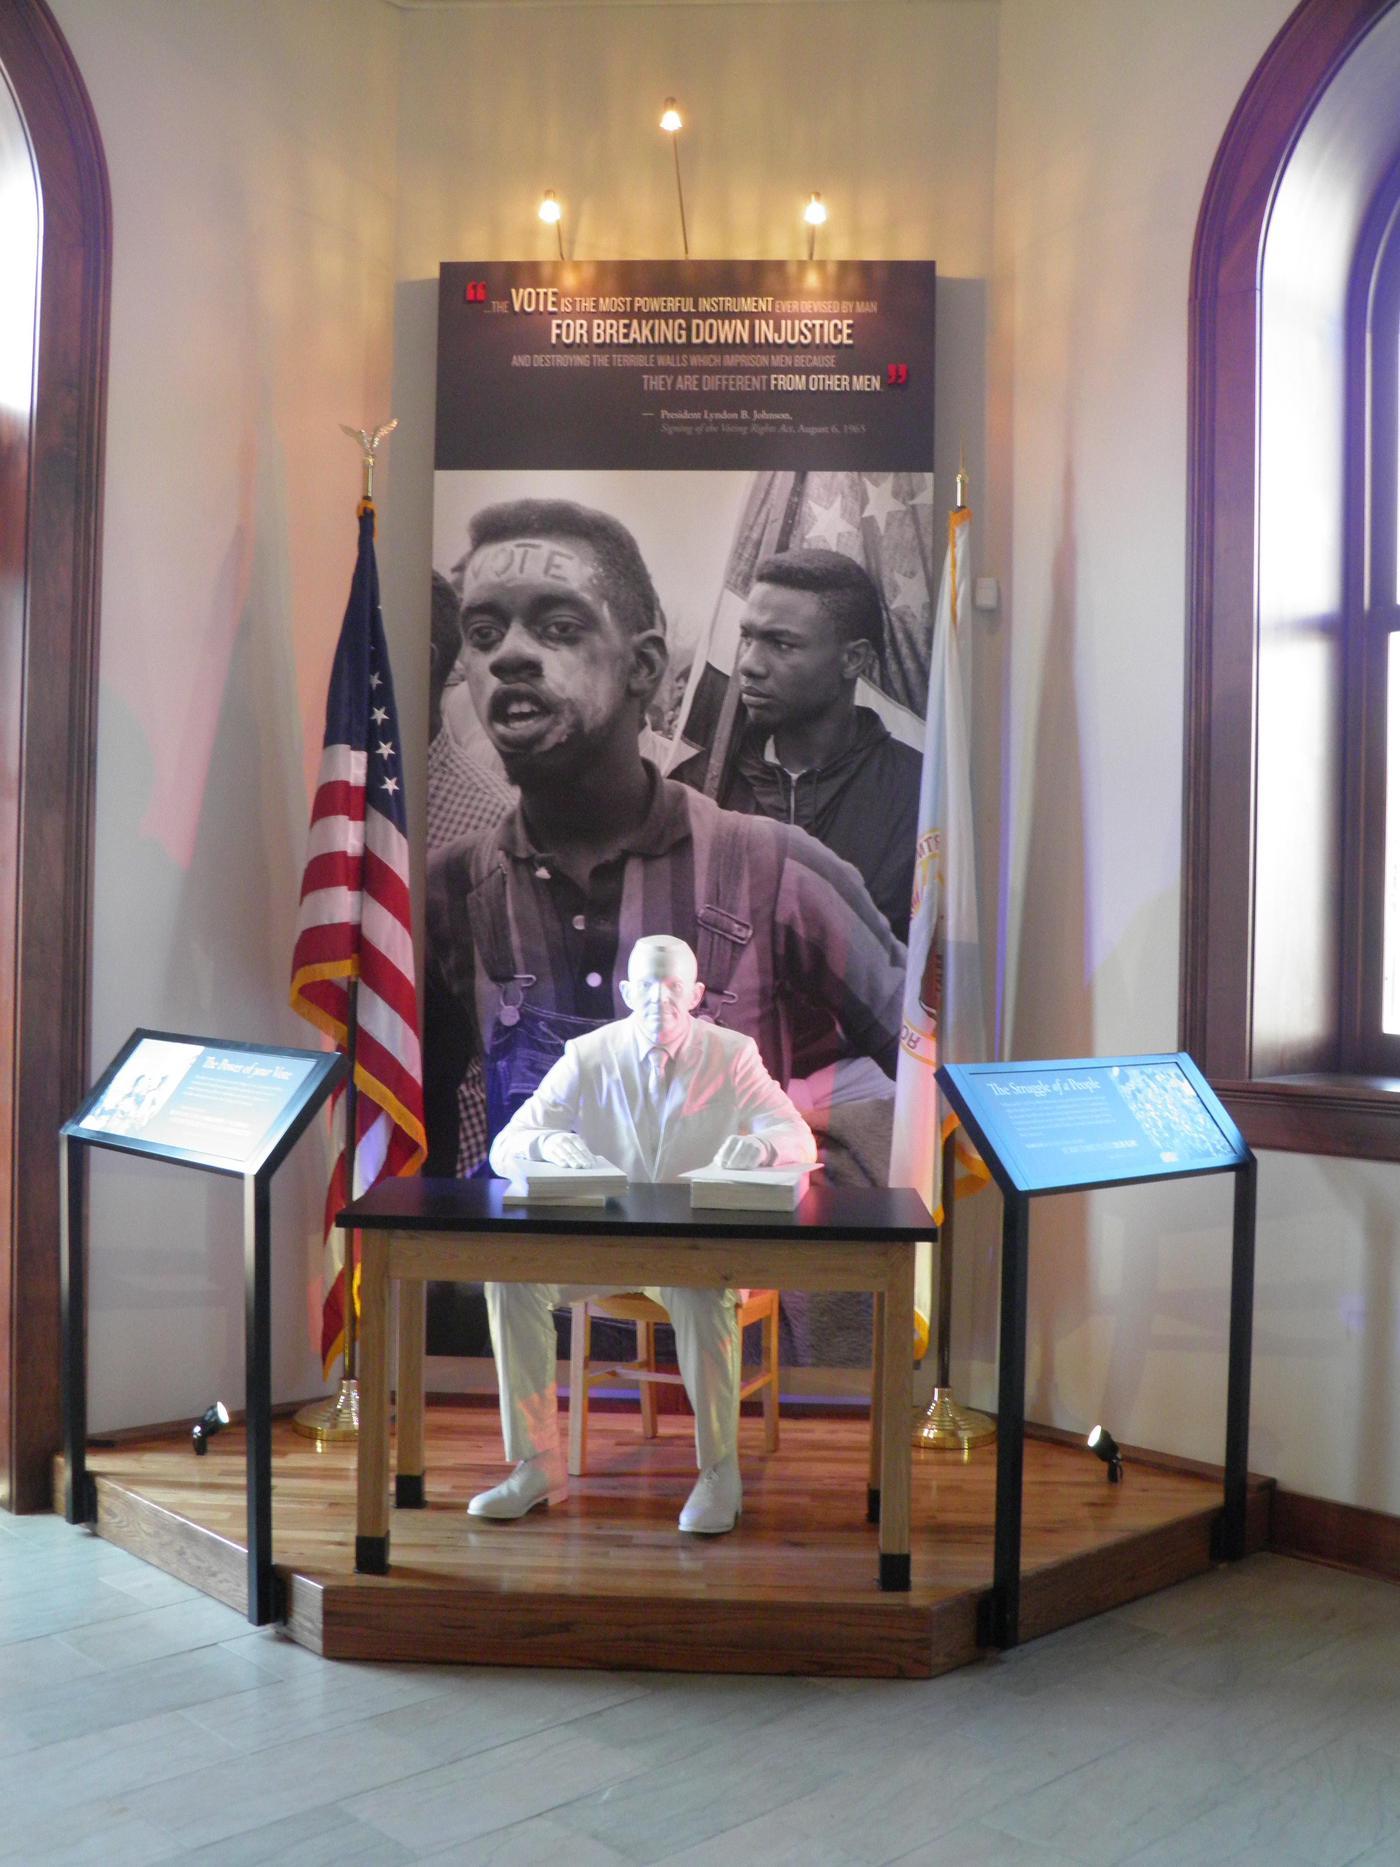 The Registrar ExhibitThe life-size, stark white registrar is hard to ignore as visitors enter the Selma Interpretive Center.